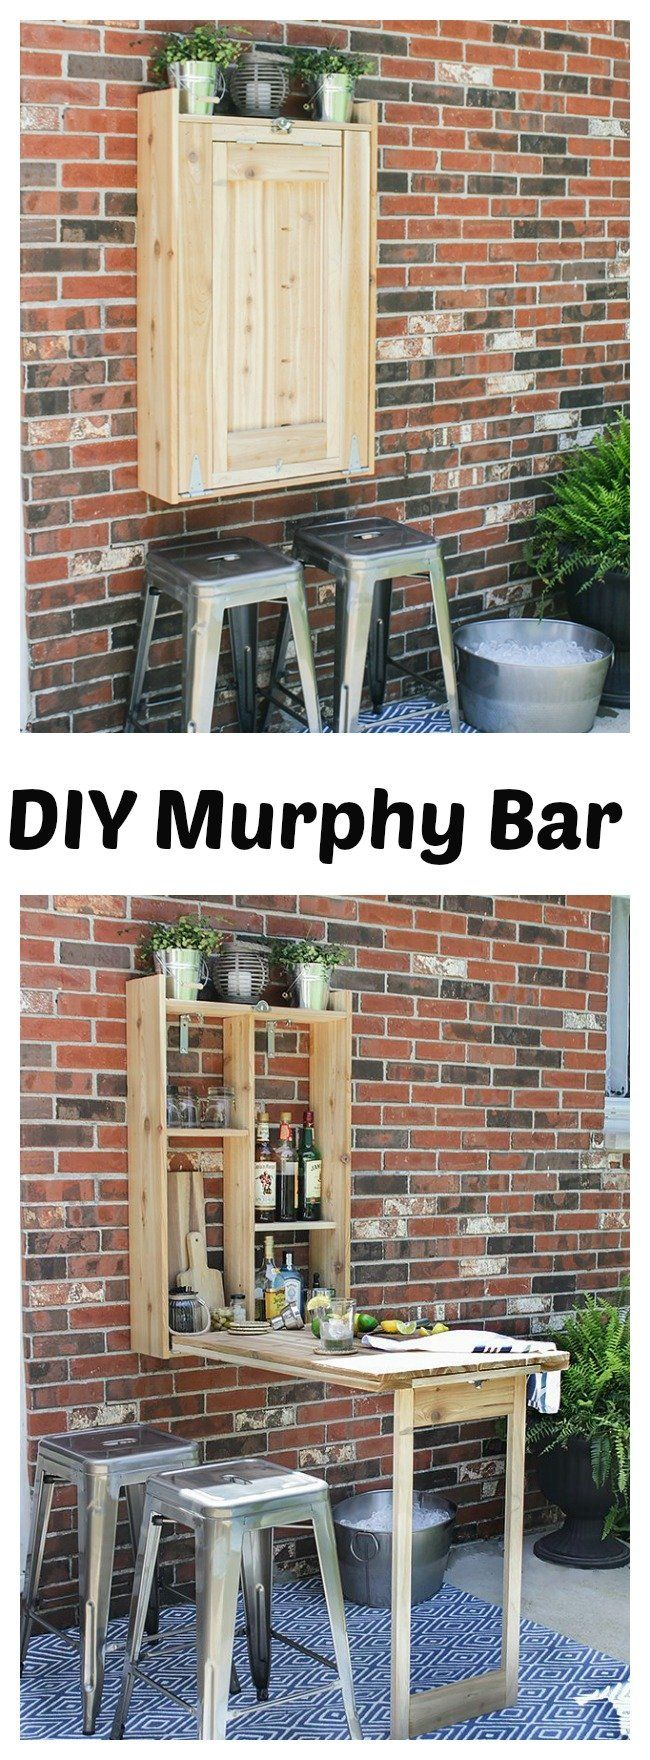 DIY Cool Fold-Down Outdoor Murphy Bar - Very Creative Idea